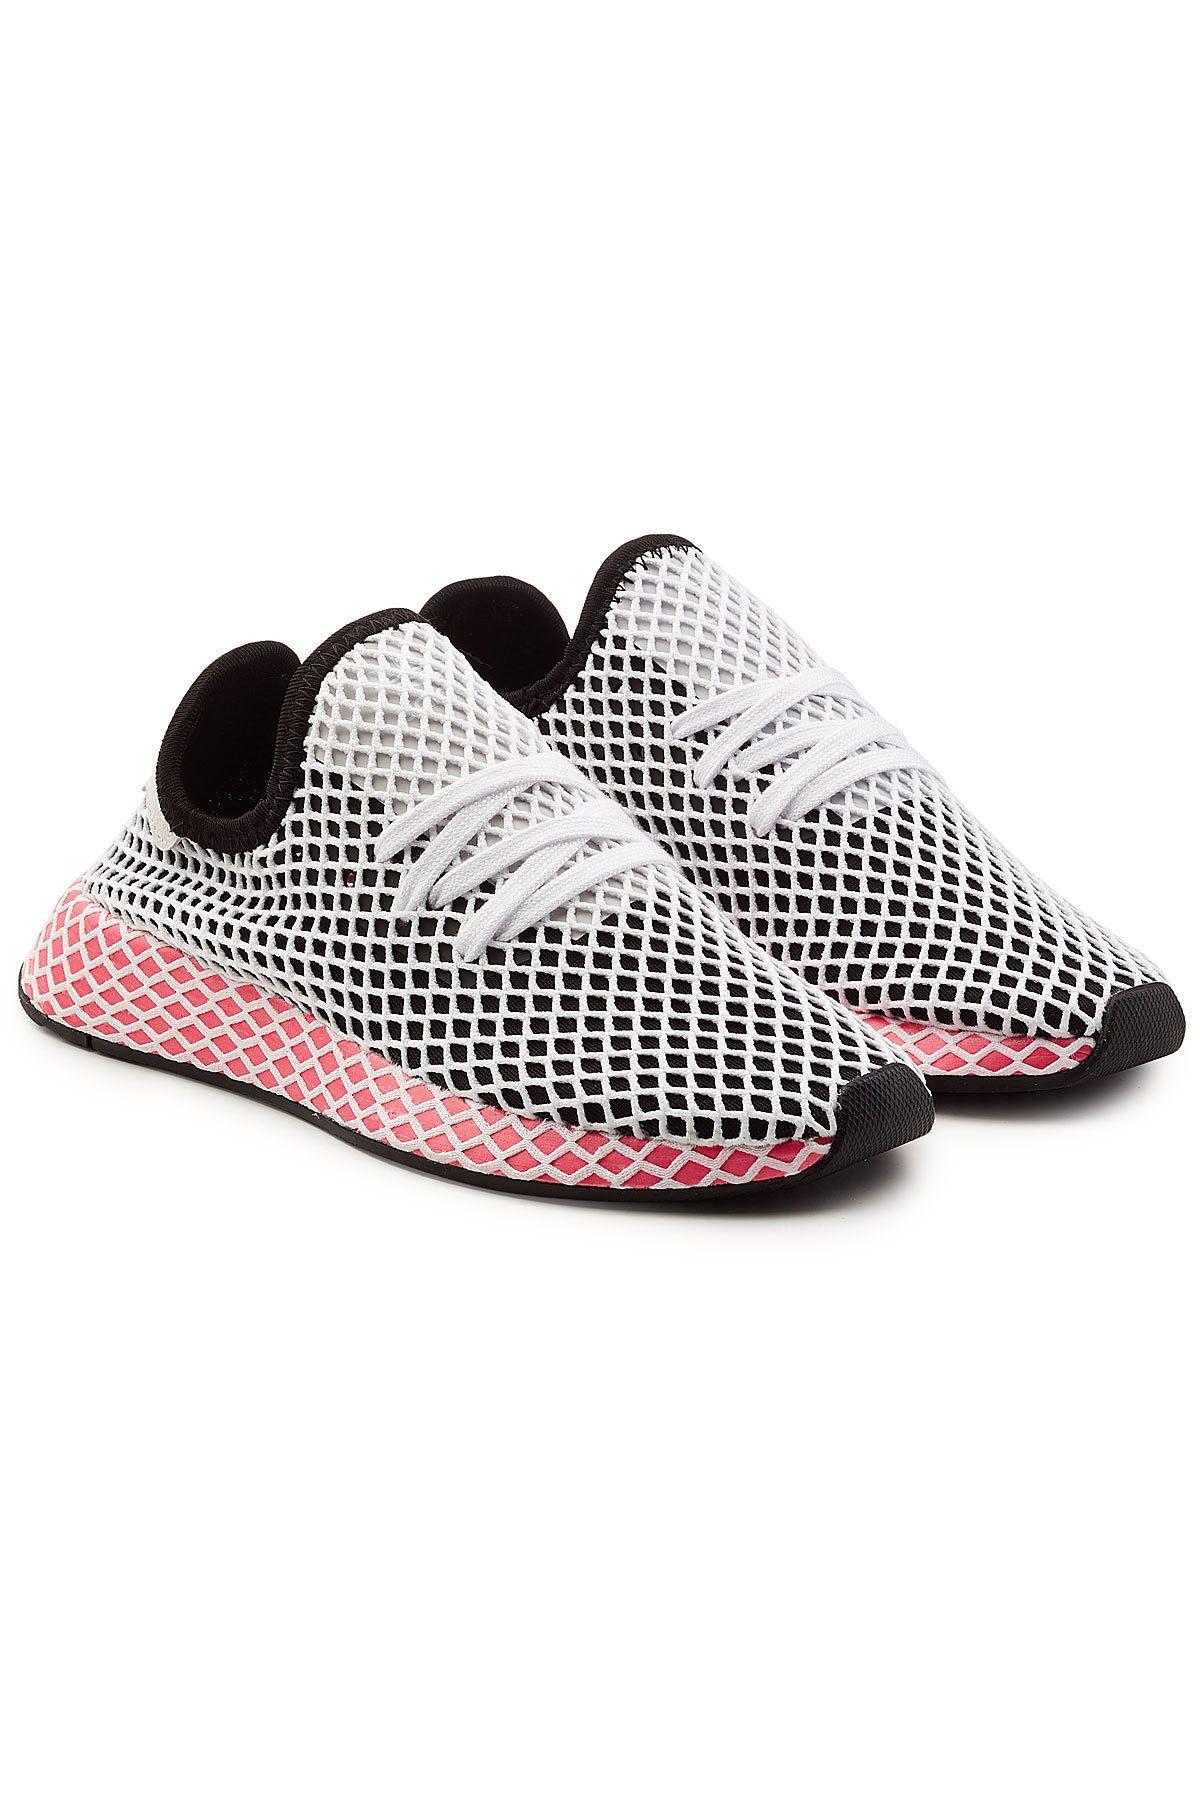 adidas originali deerupt runner adidasoriginals scarpe